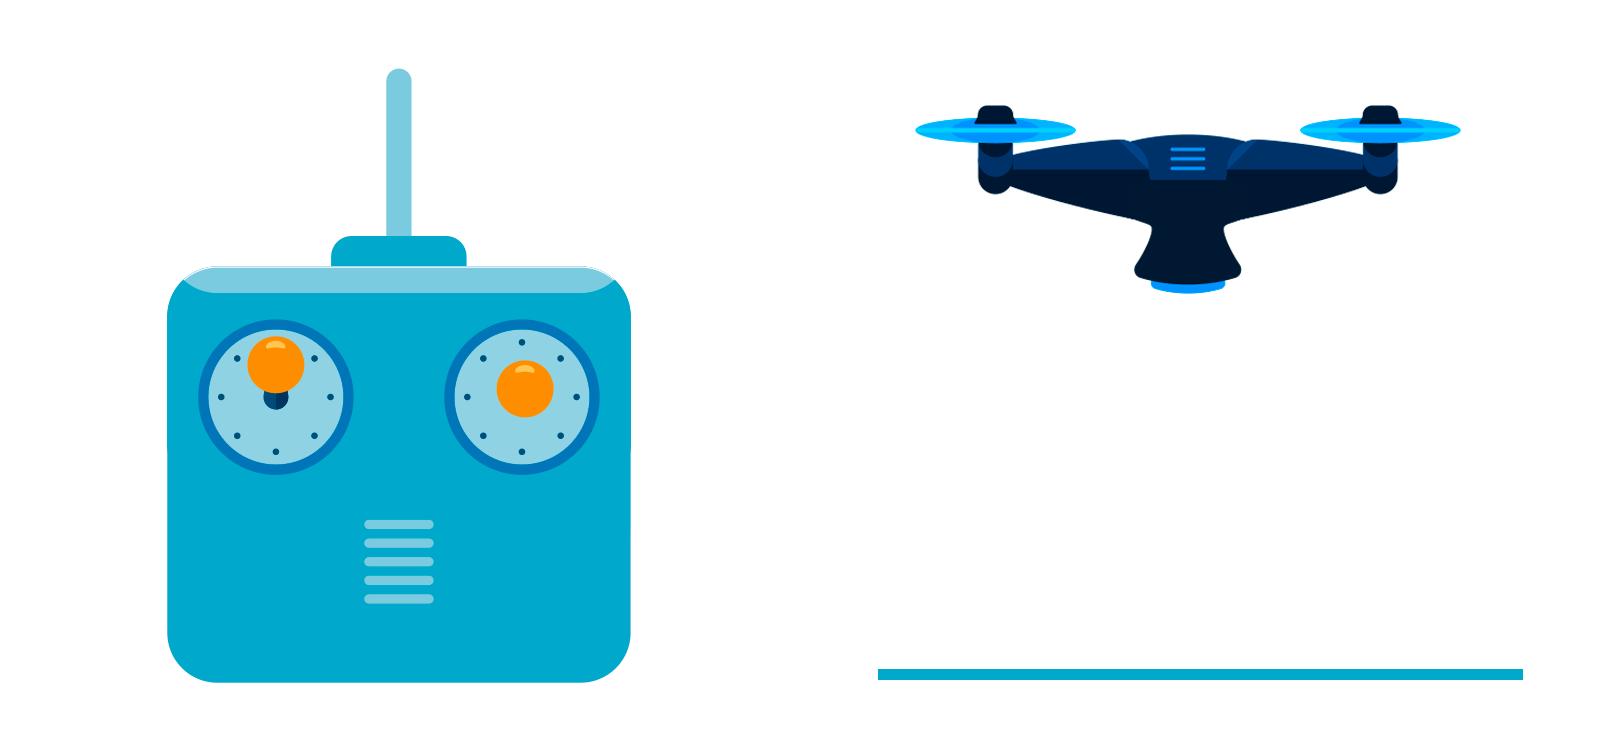 acelerador-o-gas-dron